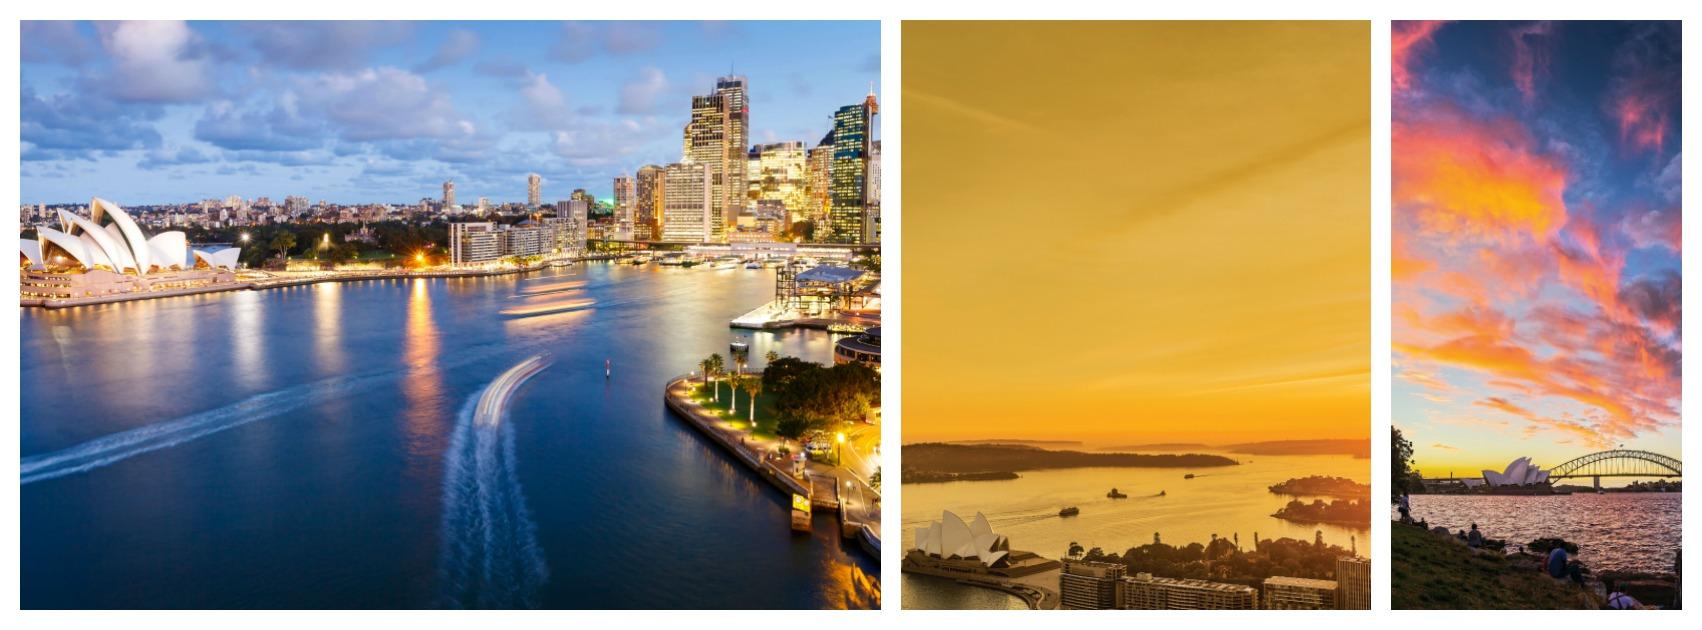 Sydney Collage 1